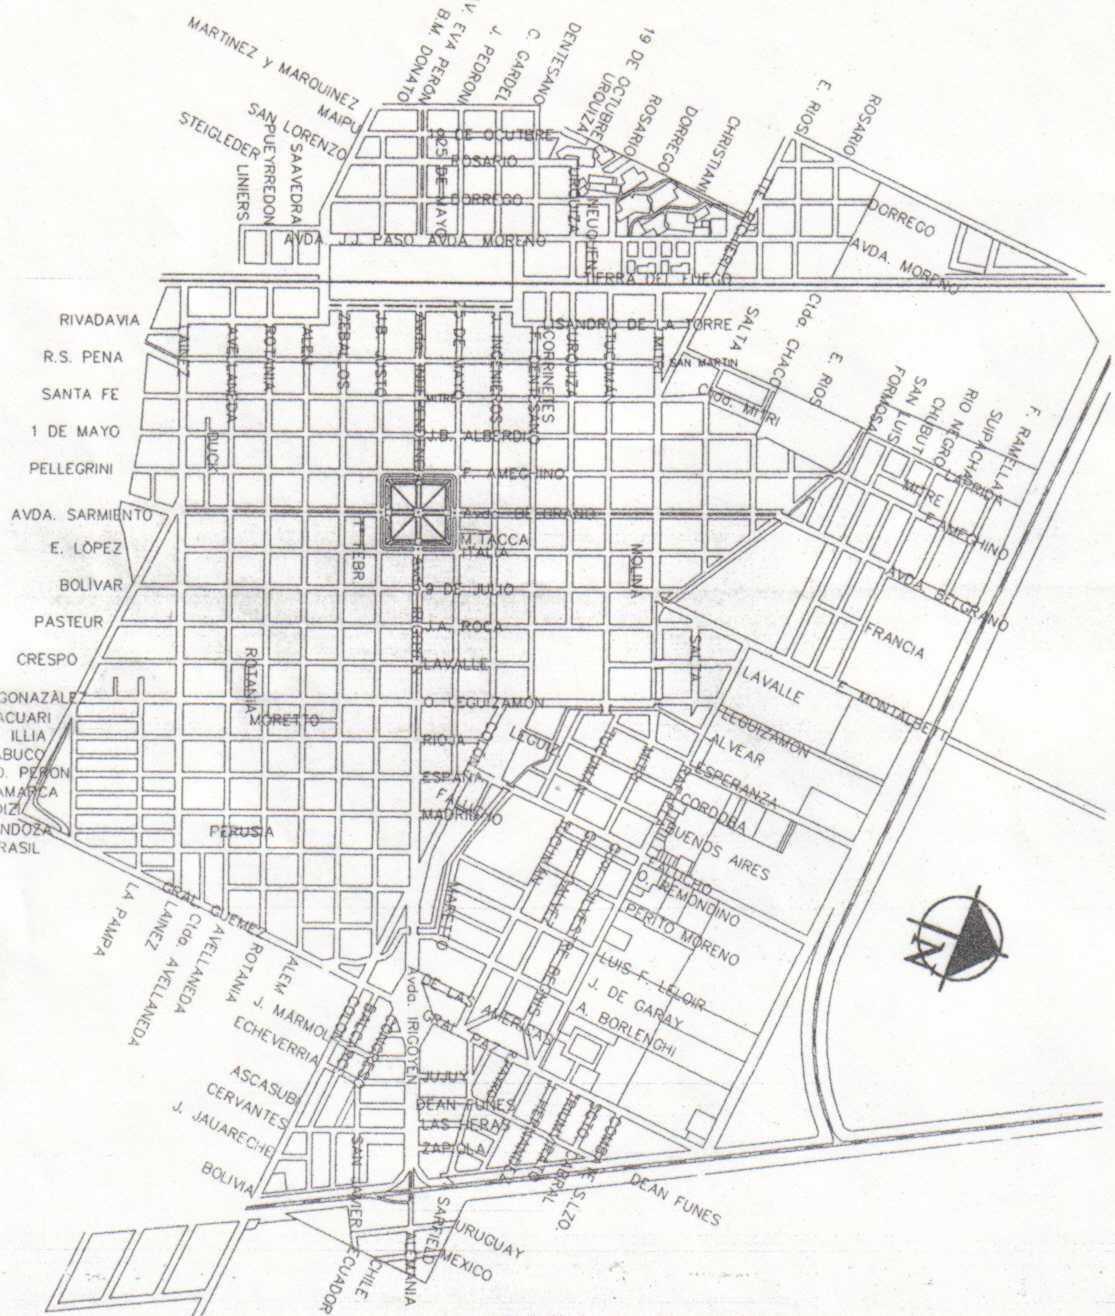 Sunchales Map, Santa Fe Prov., Argentina